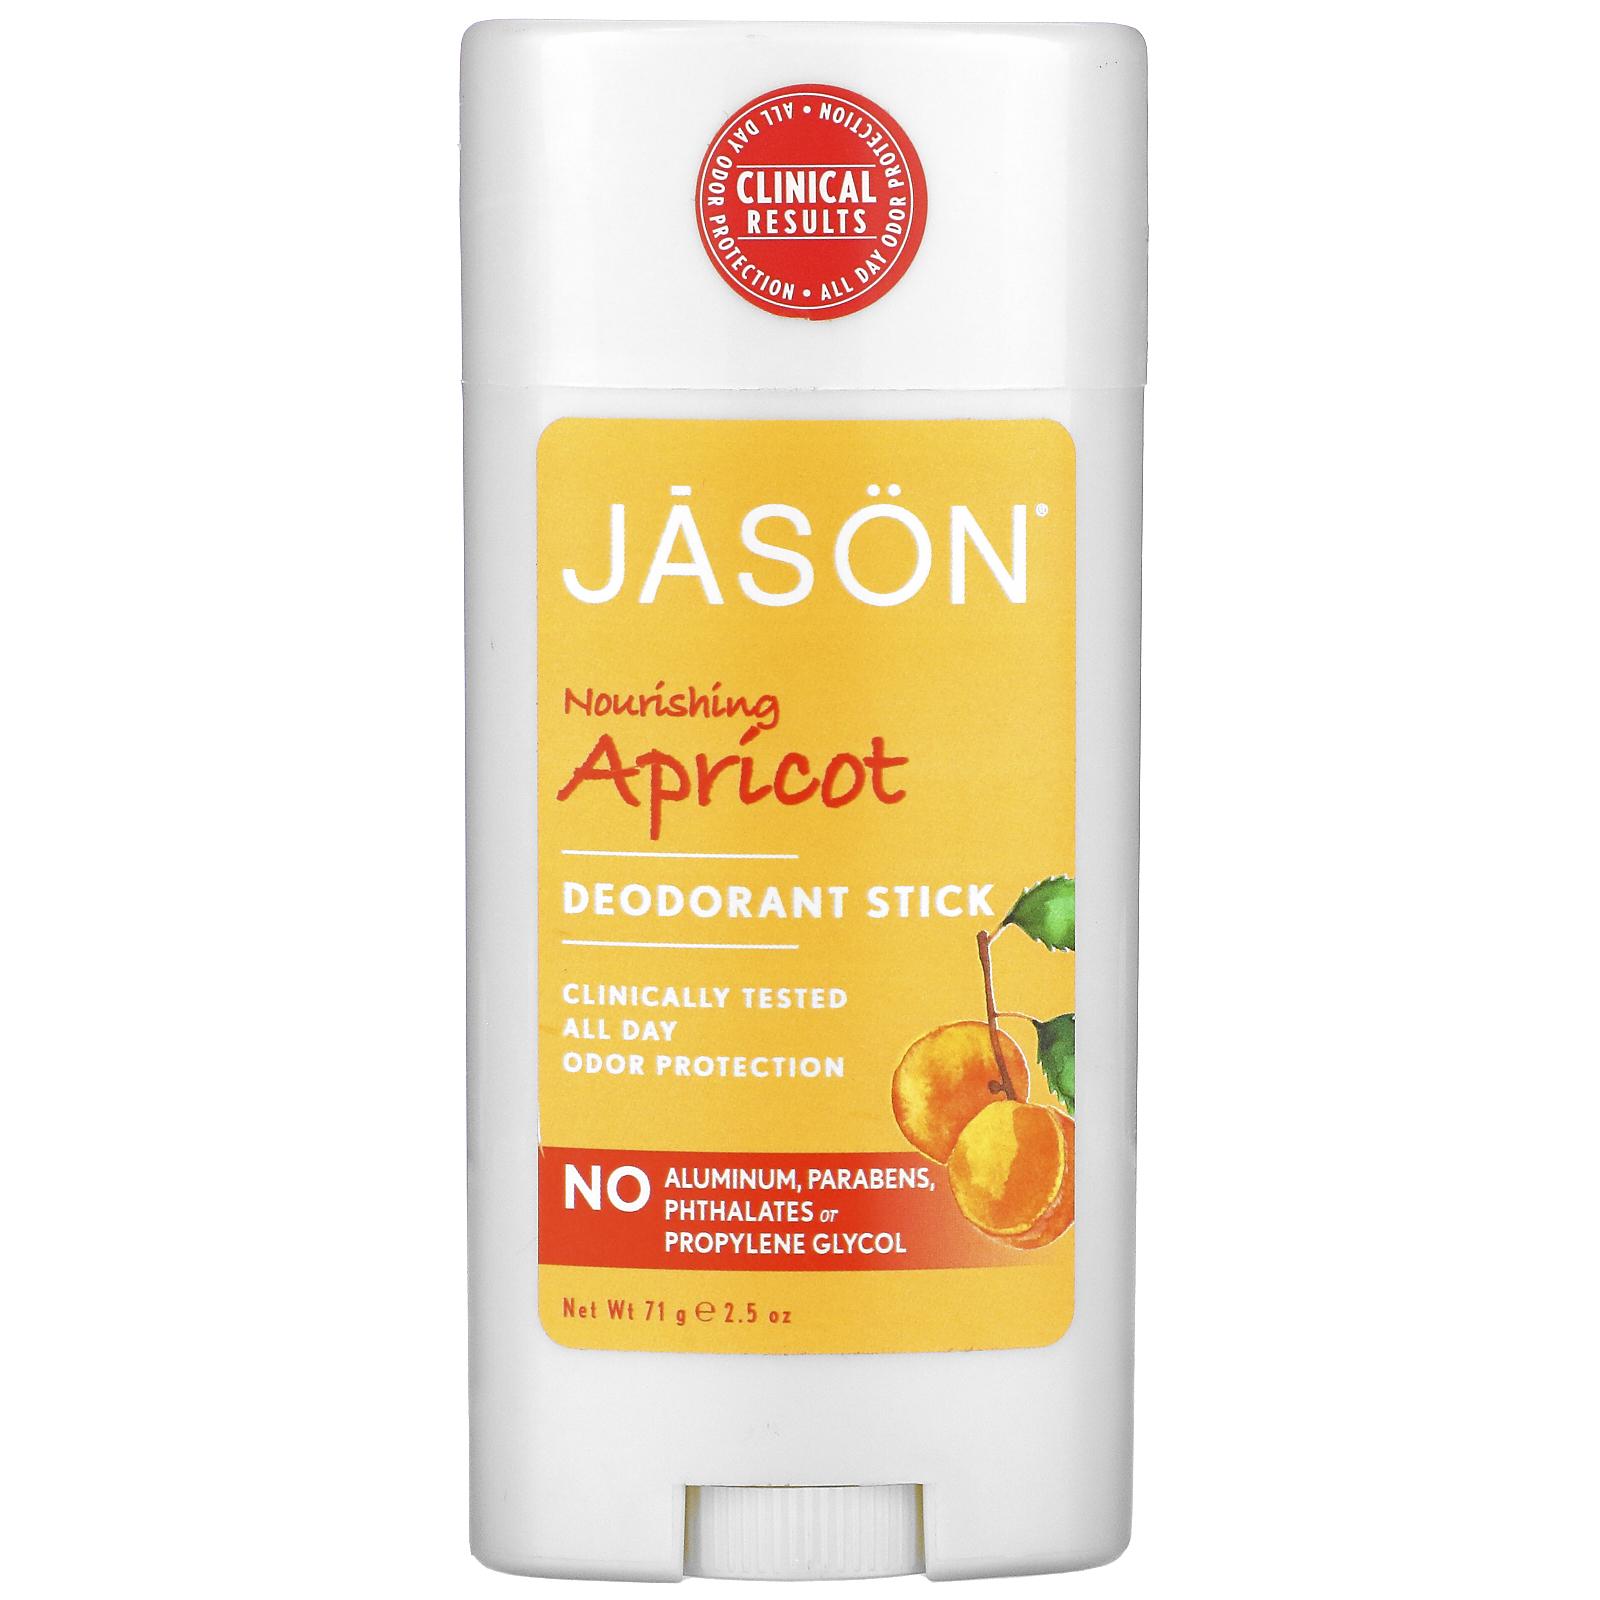 jason natural deodorant stick nourishing apricot 2 5 oz 71 g